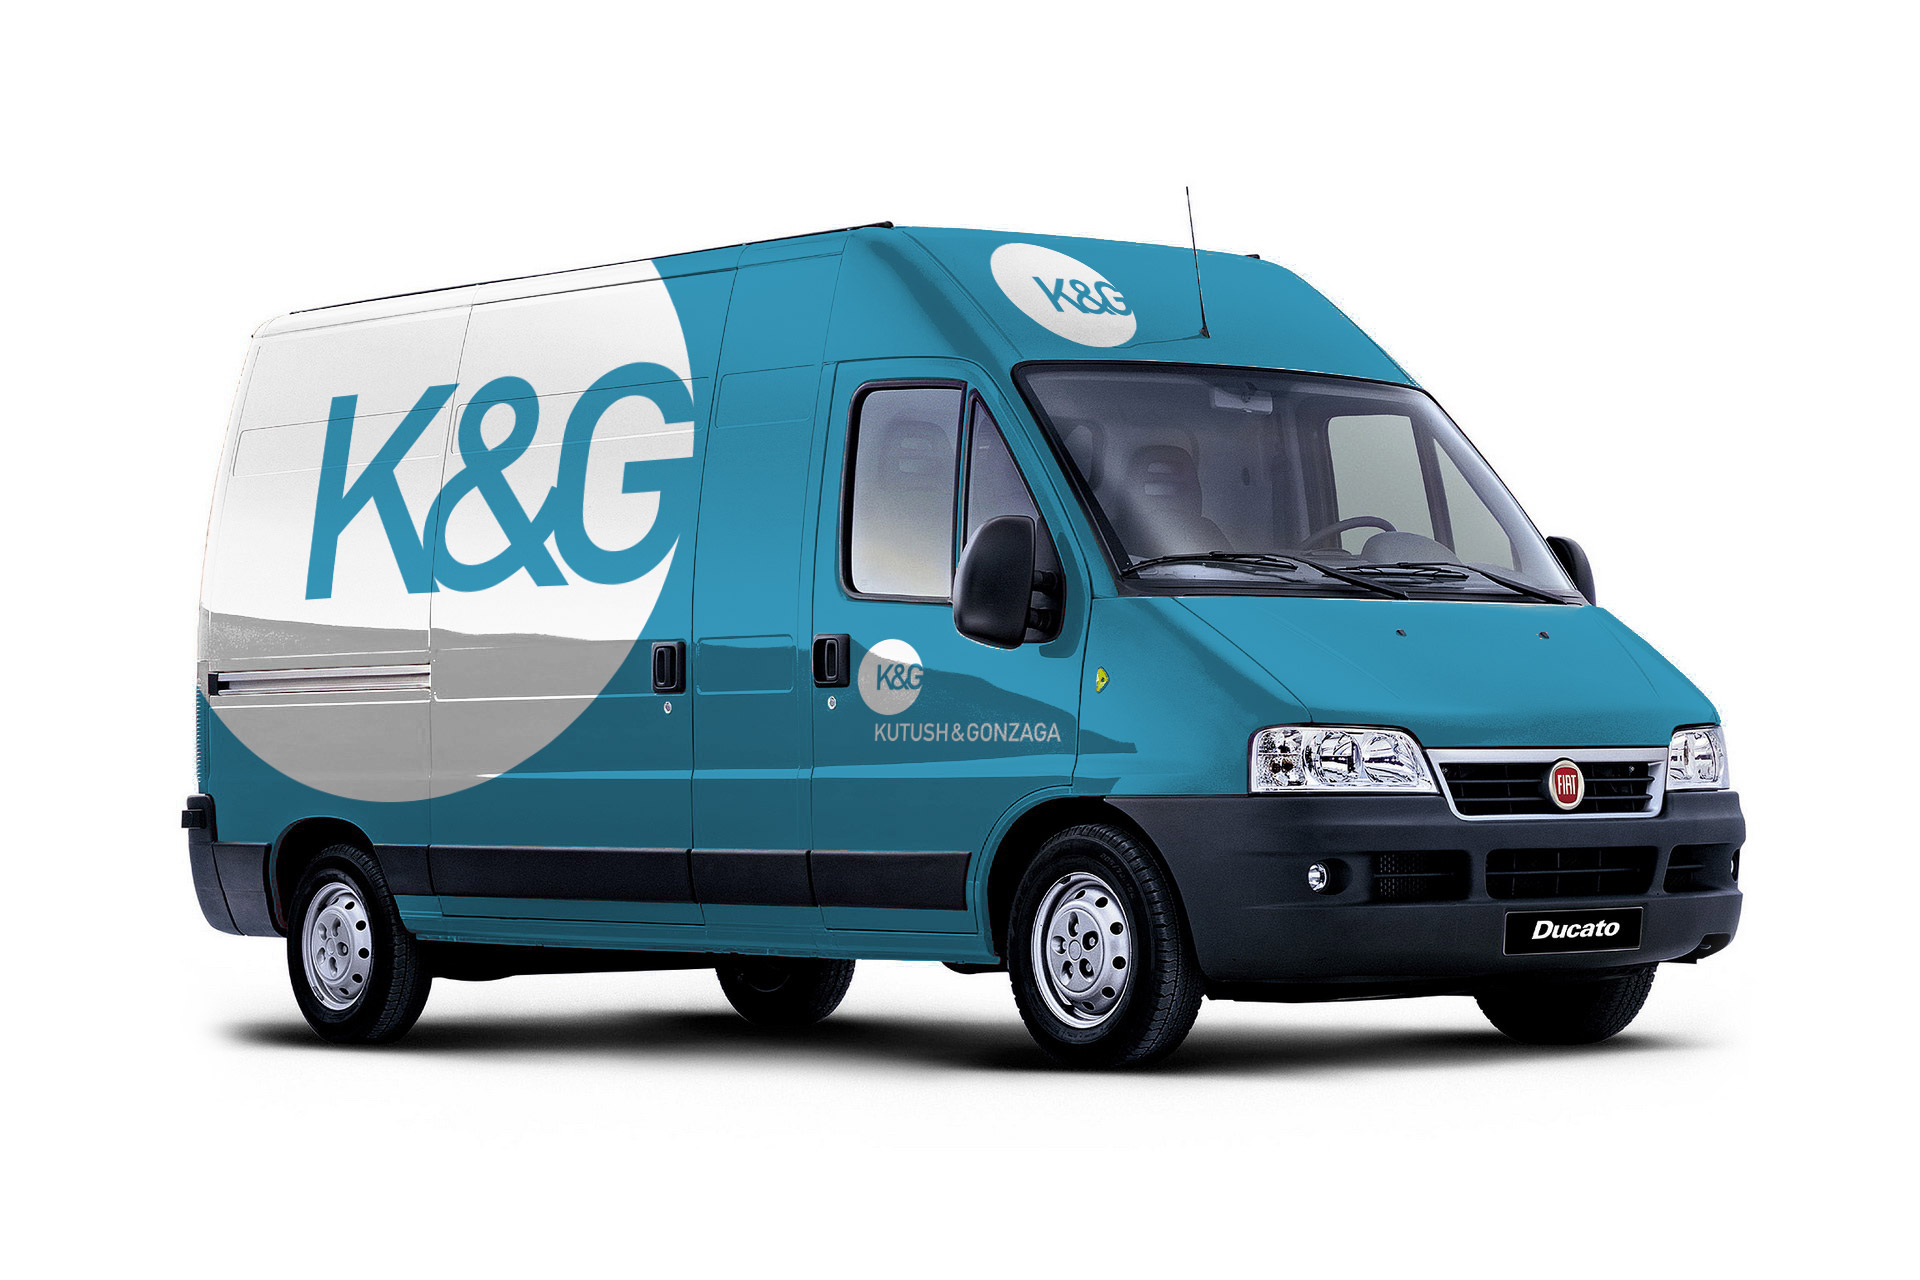 Asgard Branding, corporate identity, K&G, logo, Kutush & Gonzaga, design, car branding, store branding, online store, branding